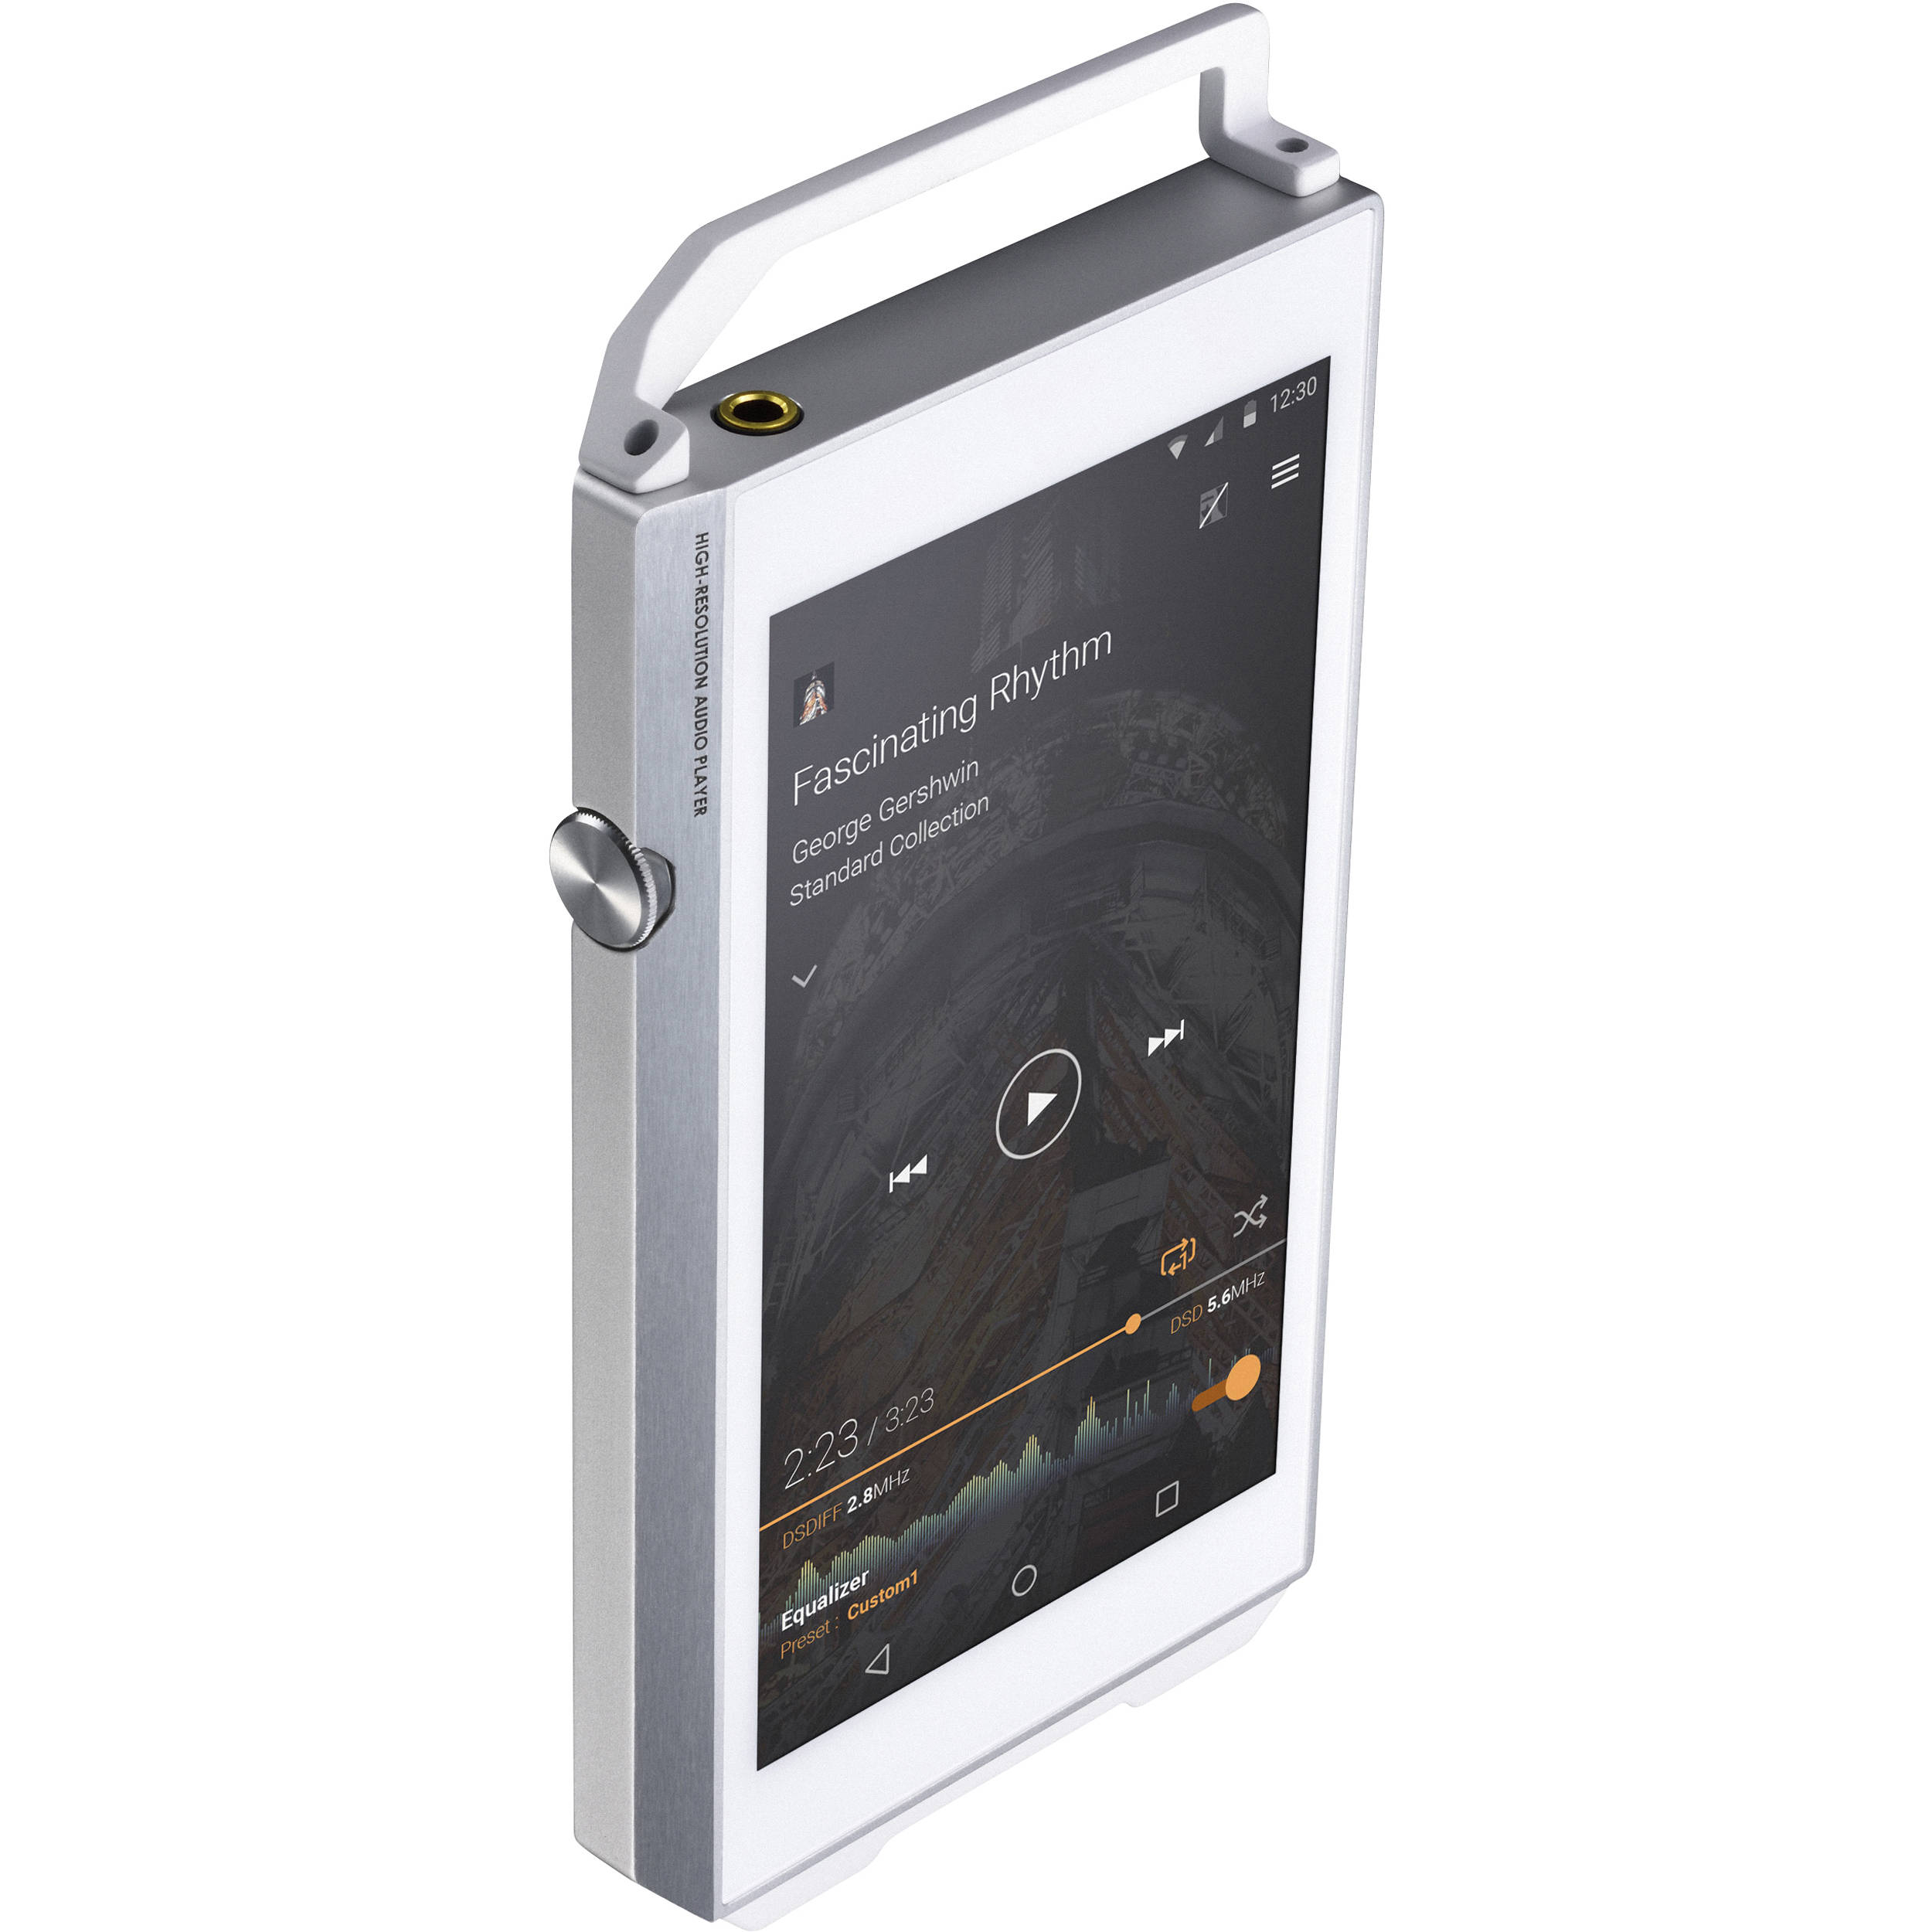 Digital Audio Video Photography: Pioneer XDP-100R Portable High-Resolution Digital XDP-100R